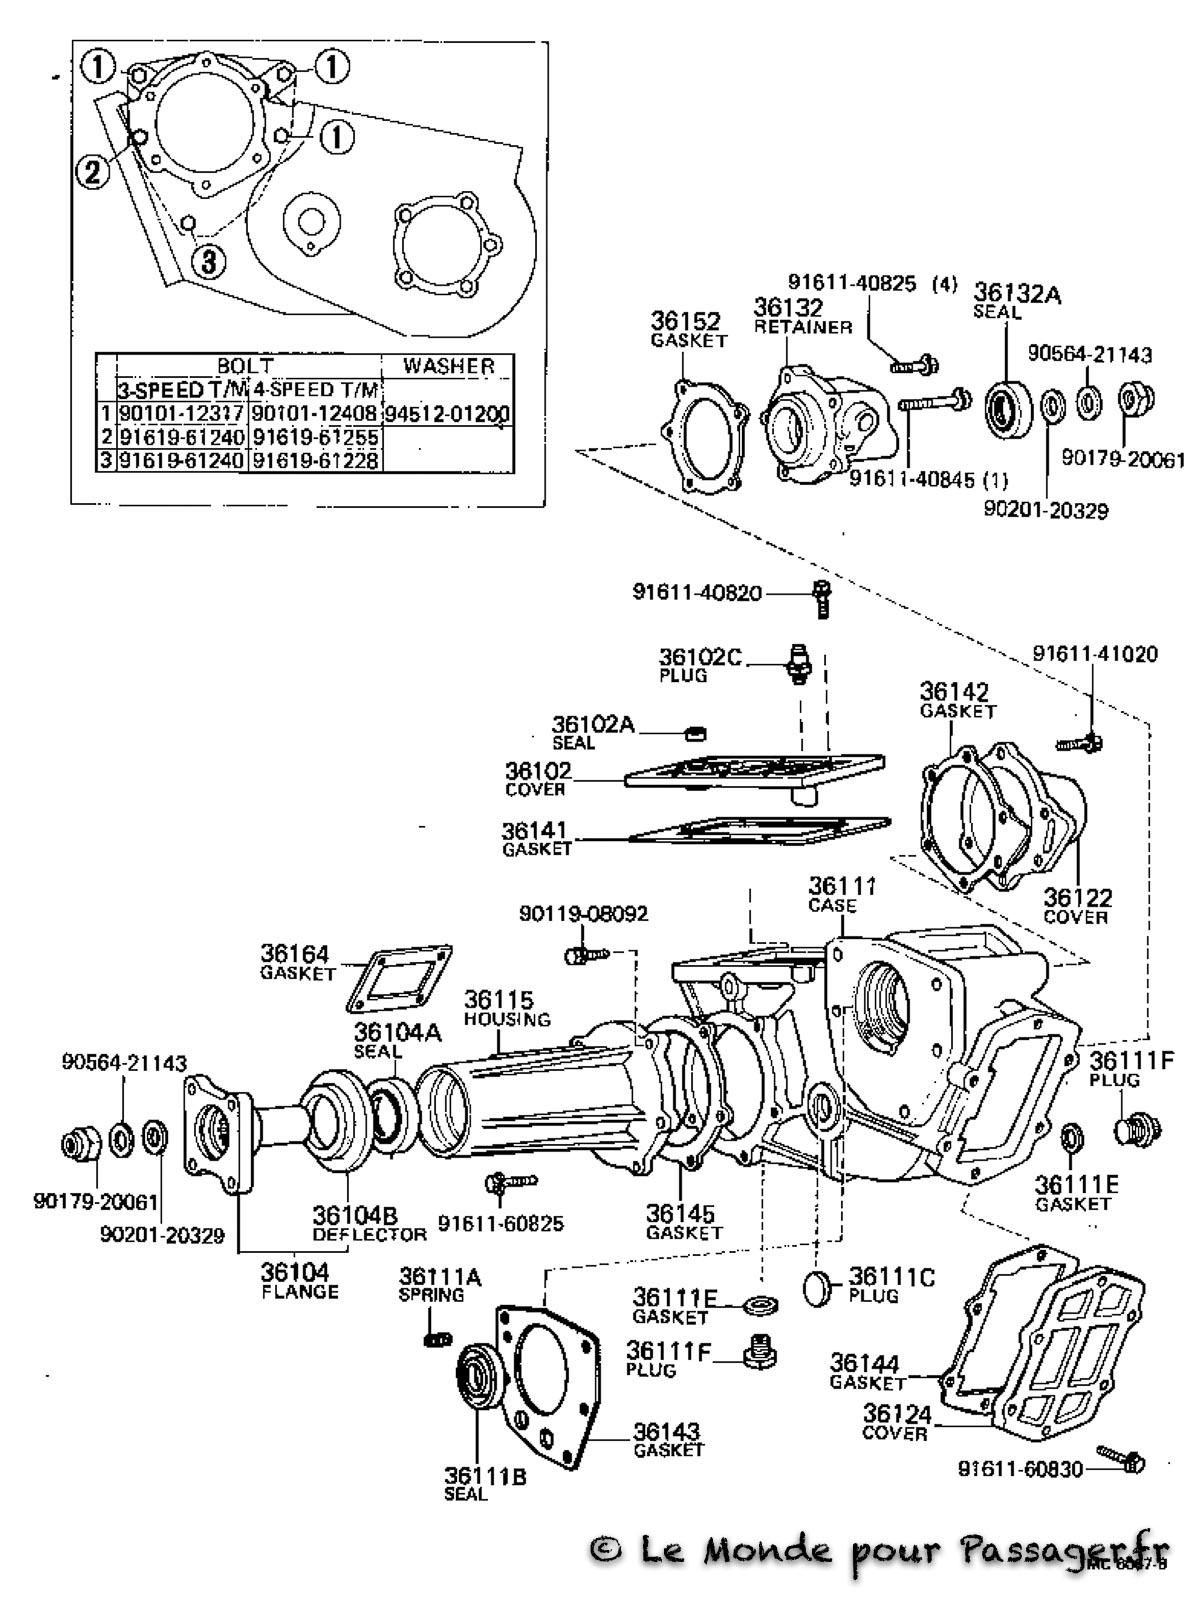 Fj55-Eclatés-Techniques049